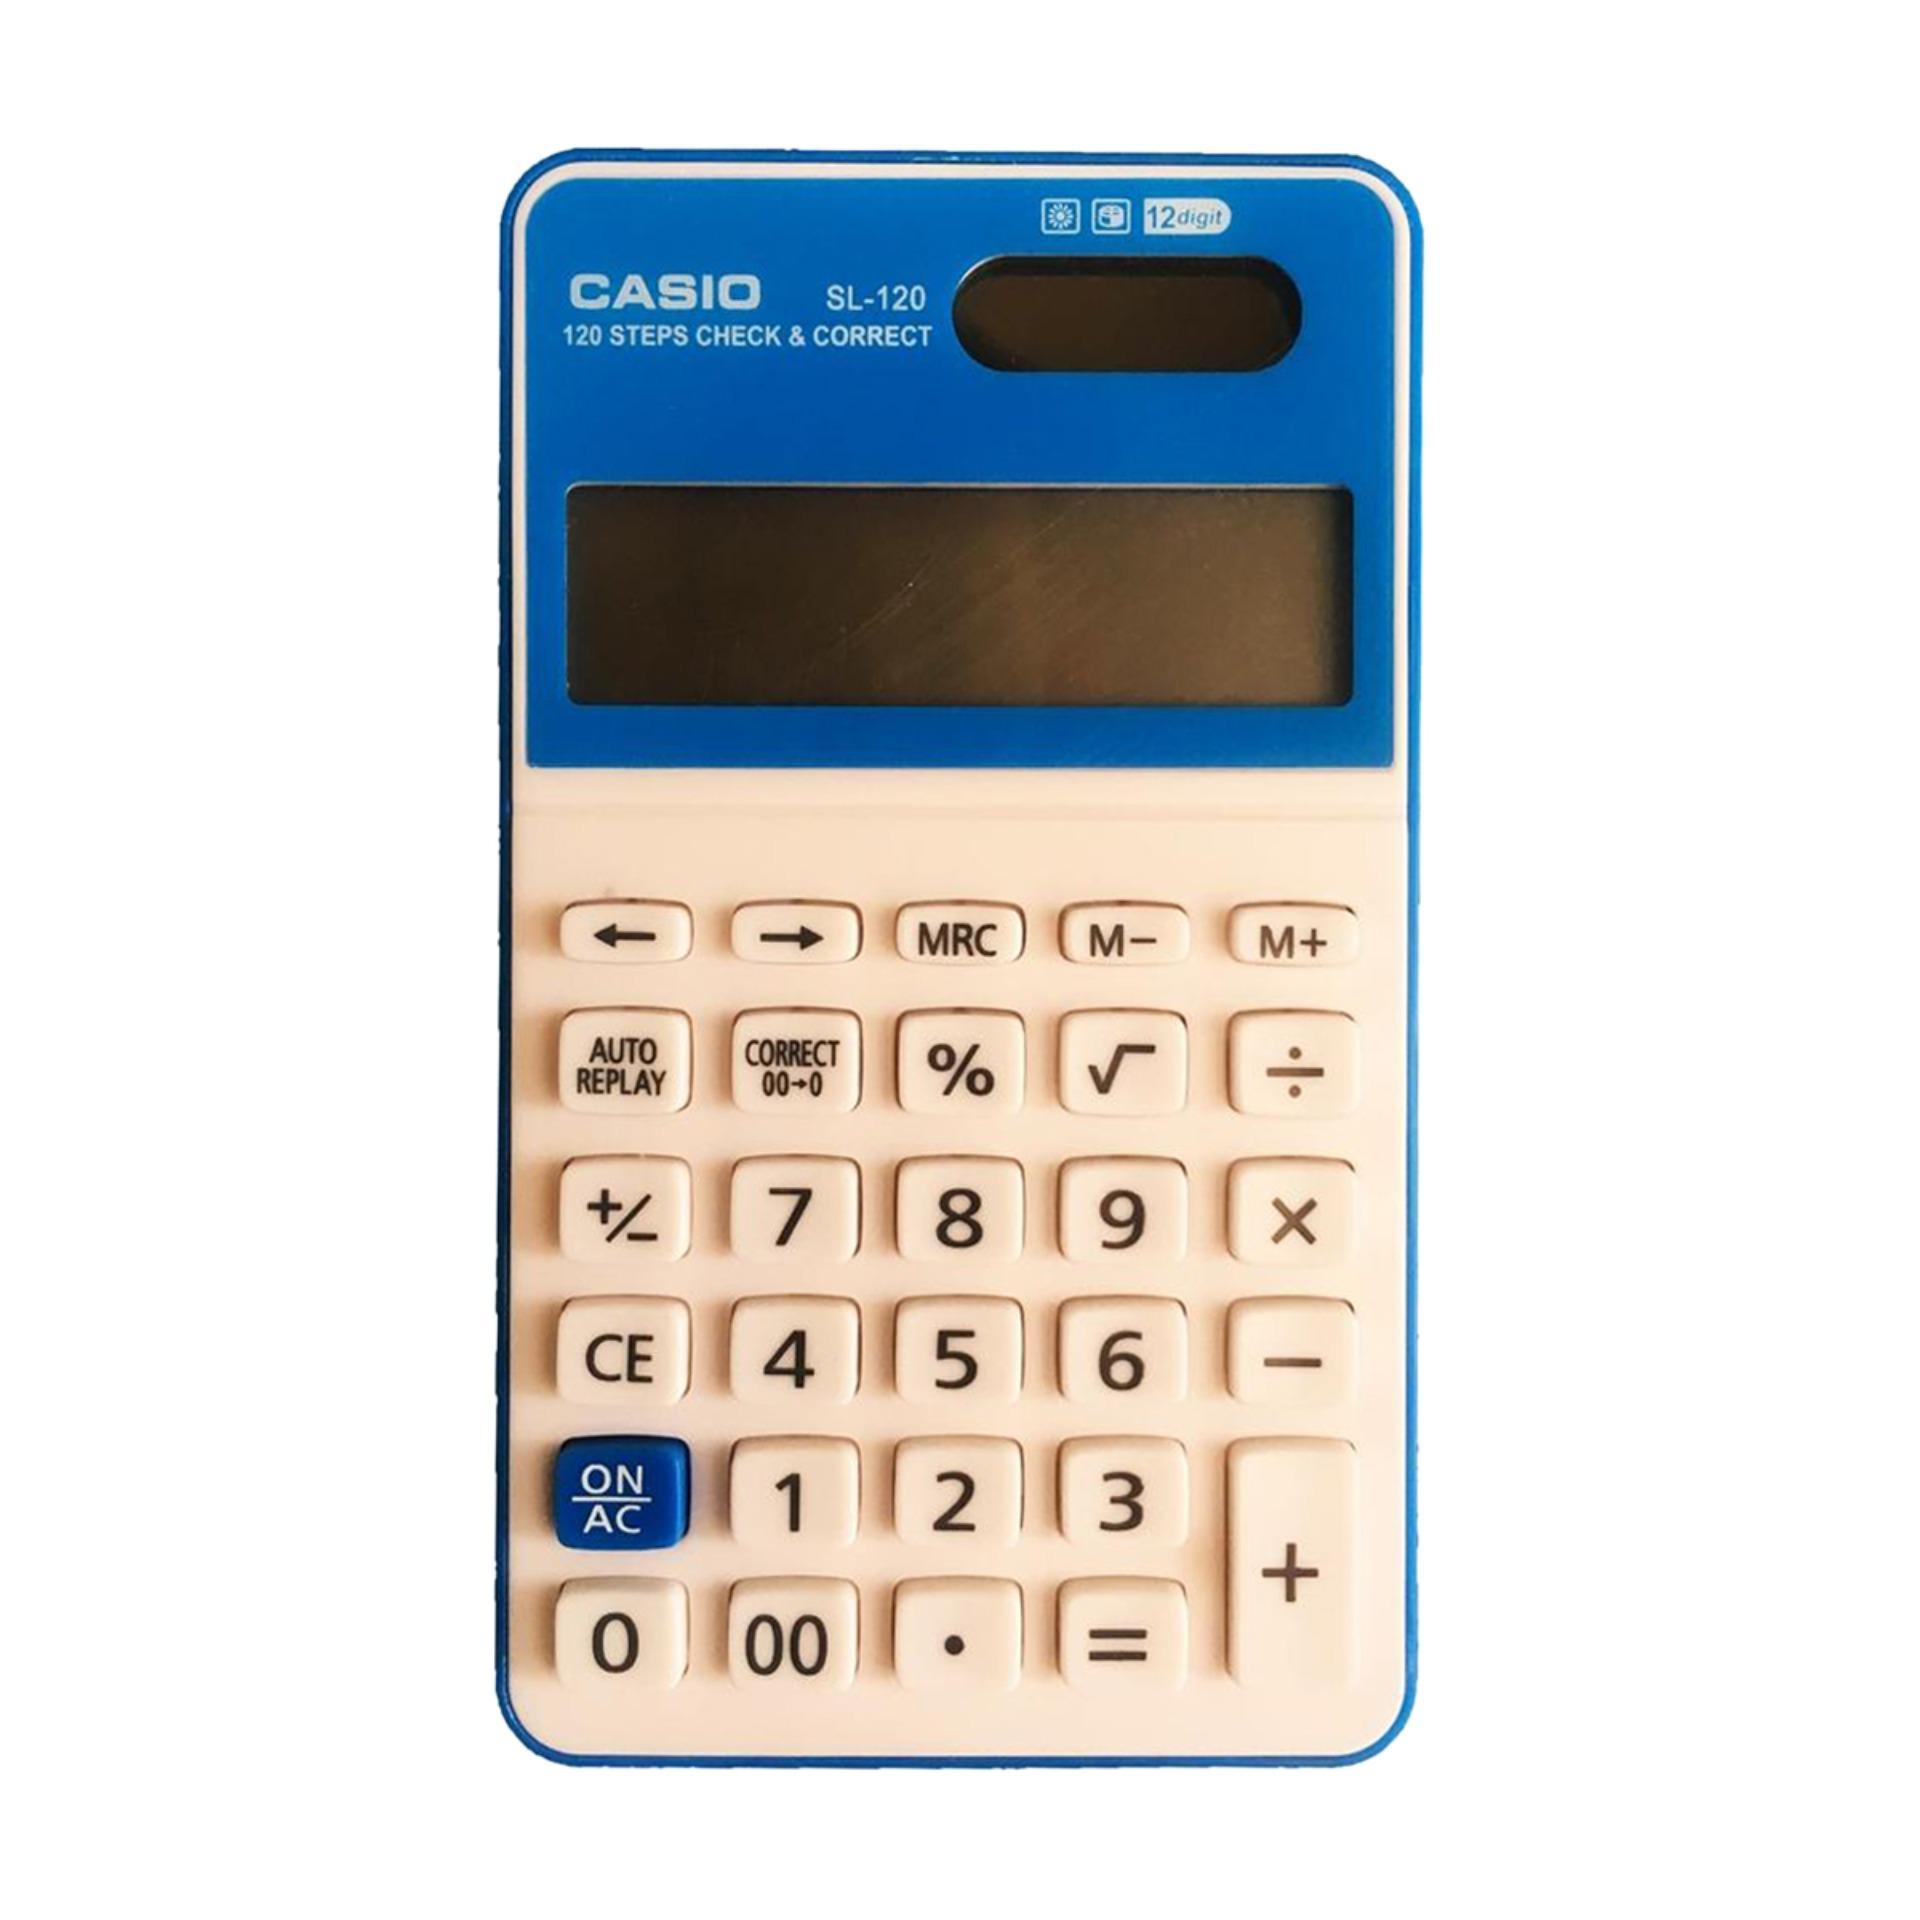 Buy Casio Home Calculators At Best Prices Online In Bangladesh Calculator Medium White